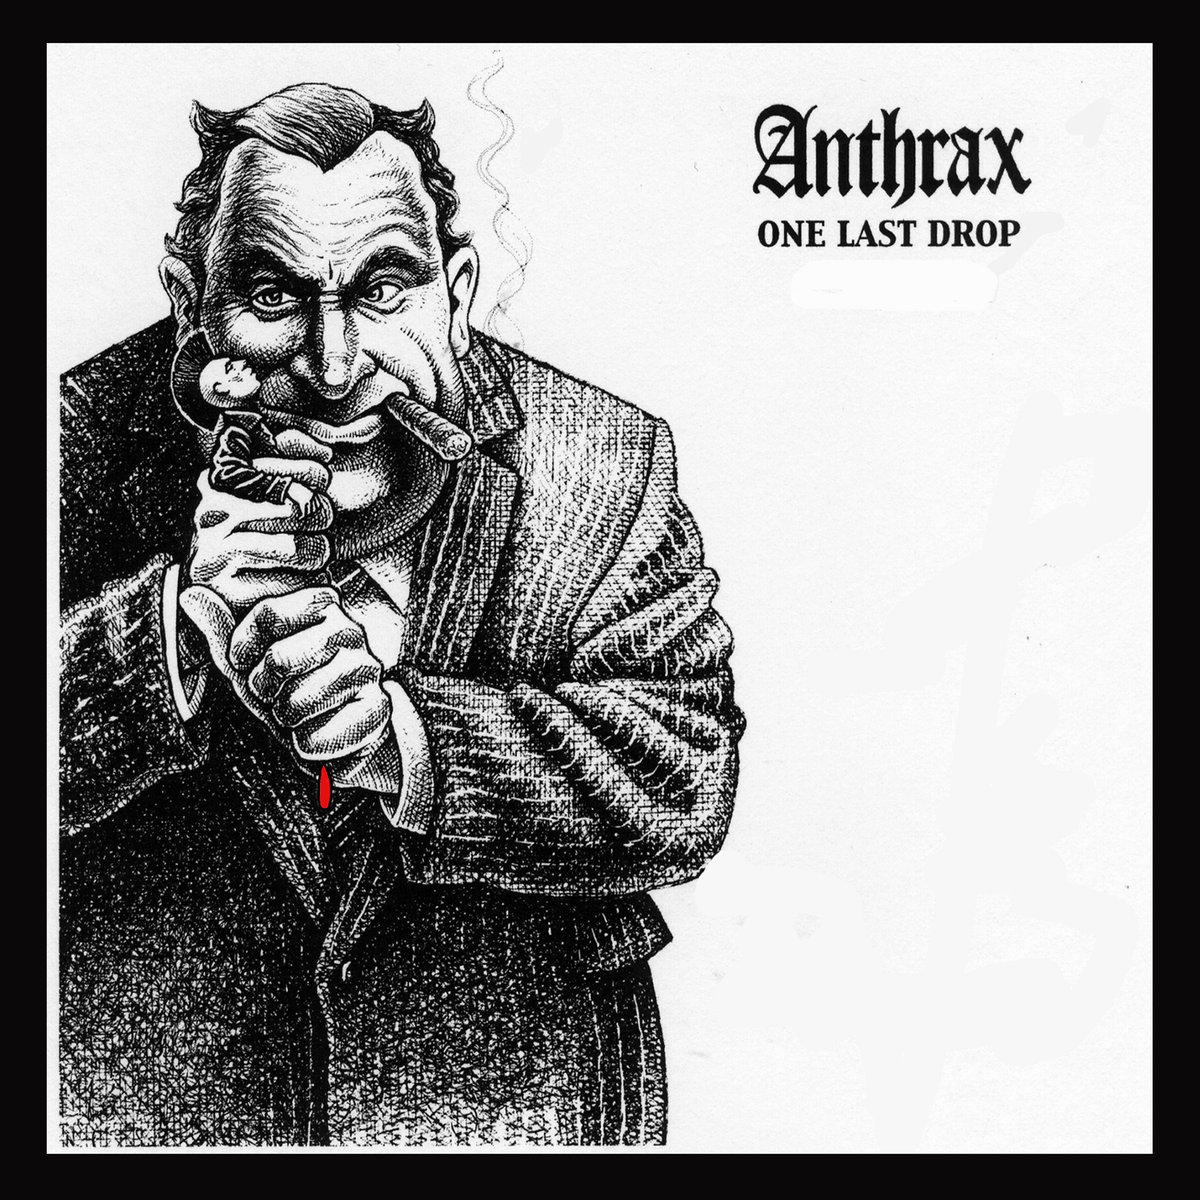 Anthrax One Last Drop